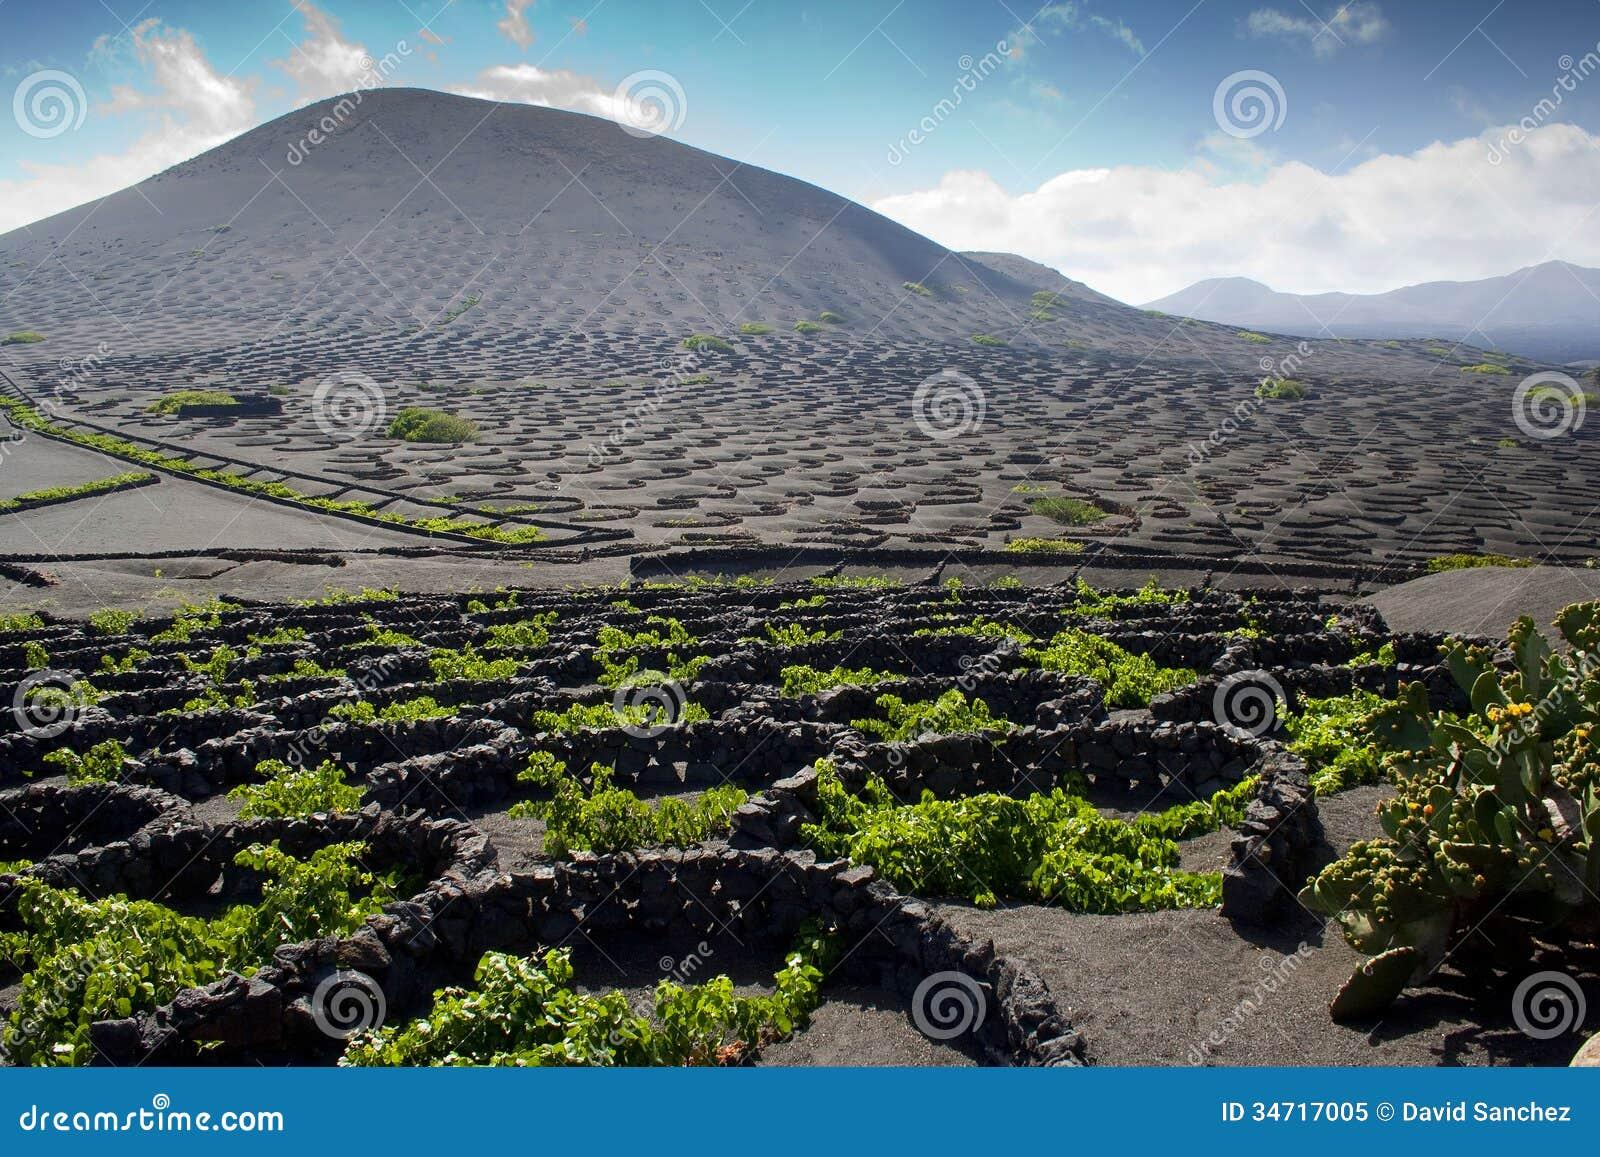 Free Plans Vineyard In Lanzarote Landscape Of Lanzarote Stock Image